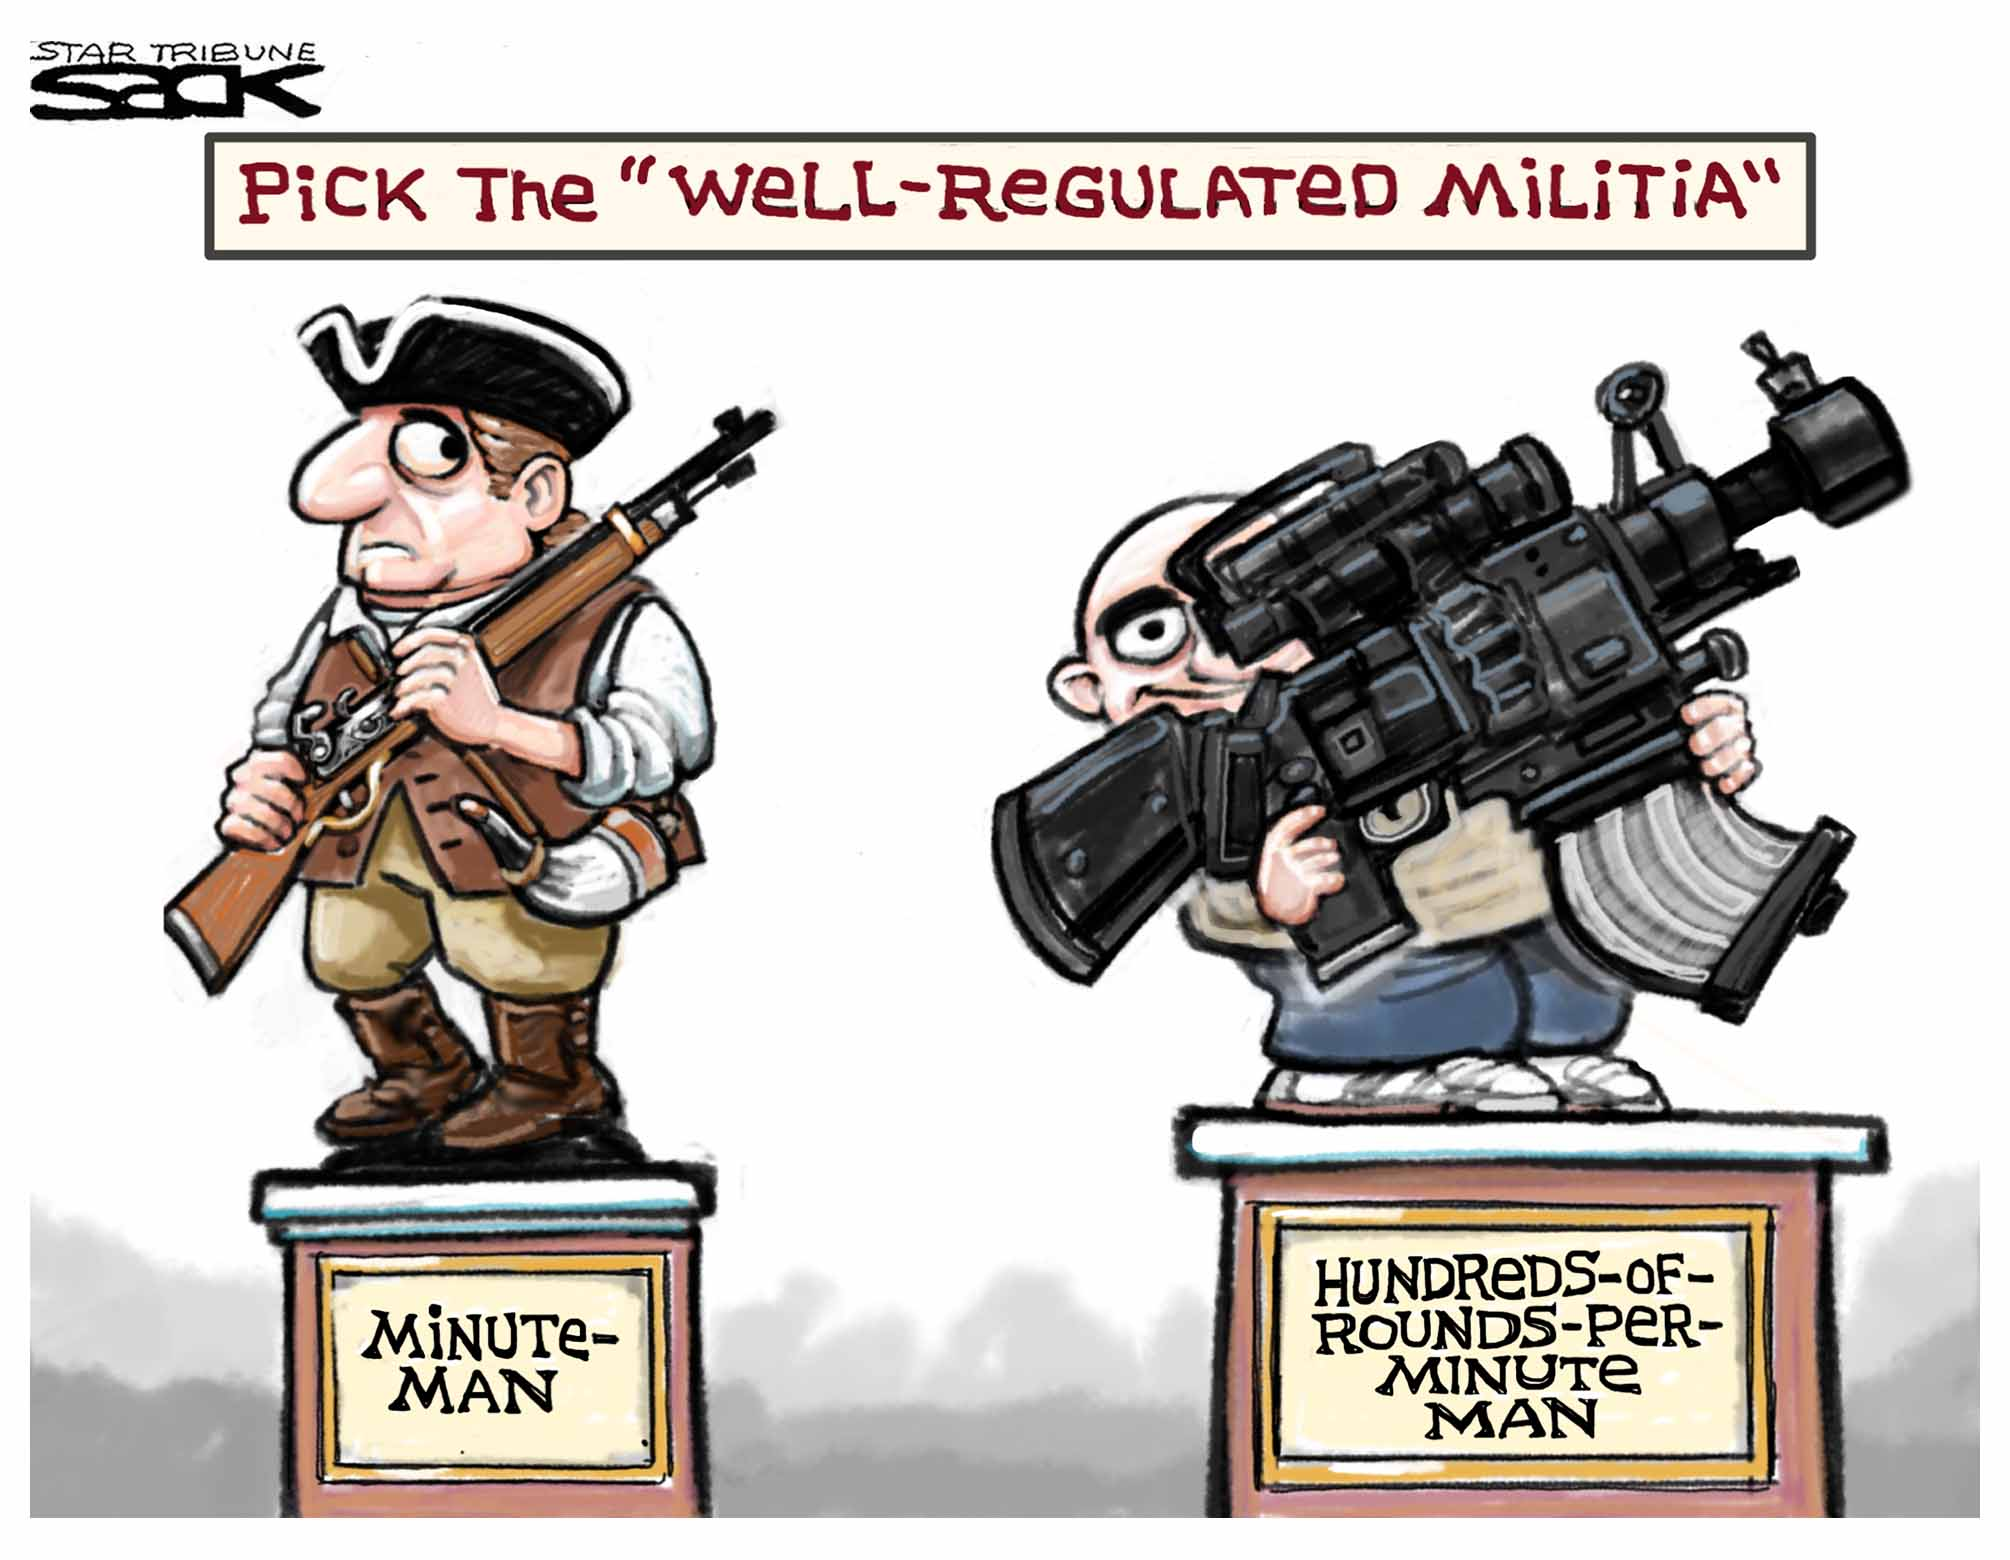 e88cc1daf Guns Kill People - Being Libertarian